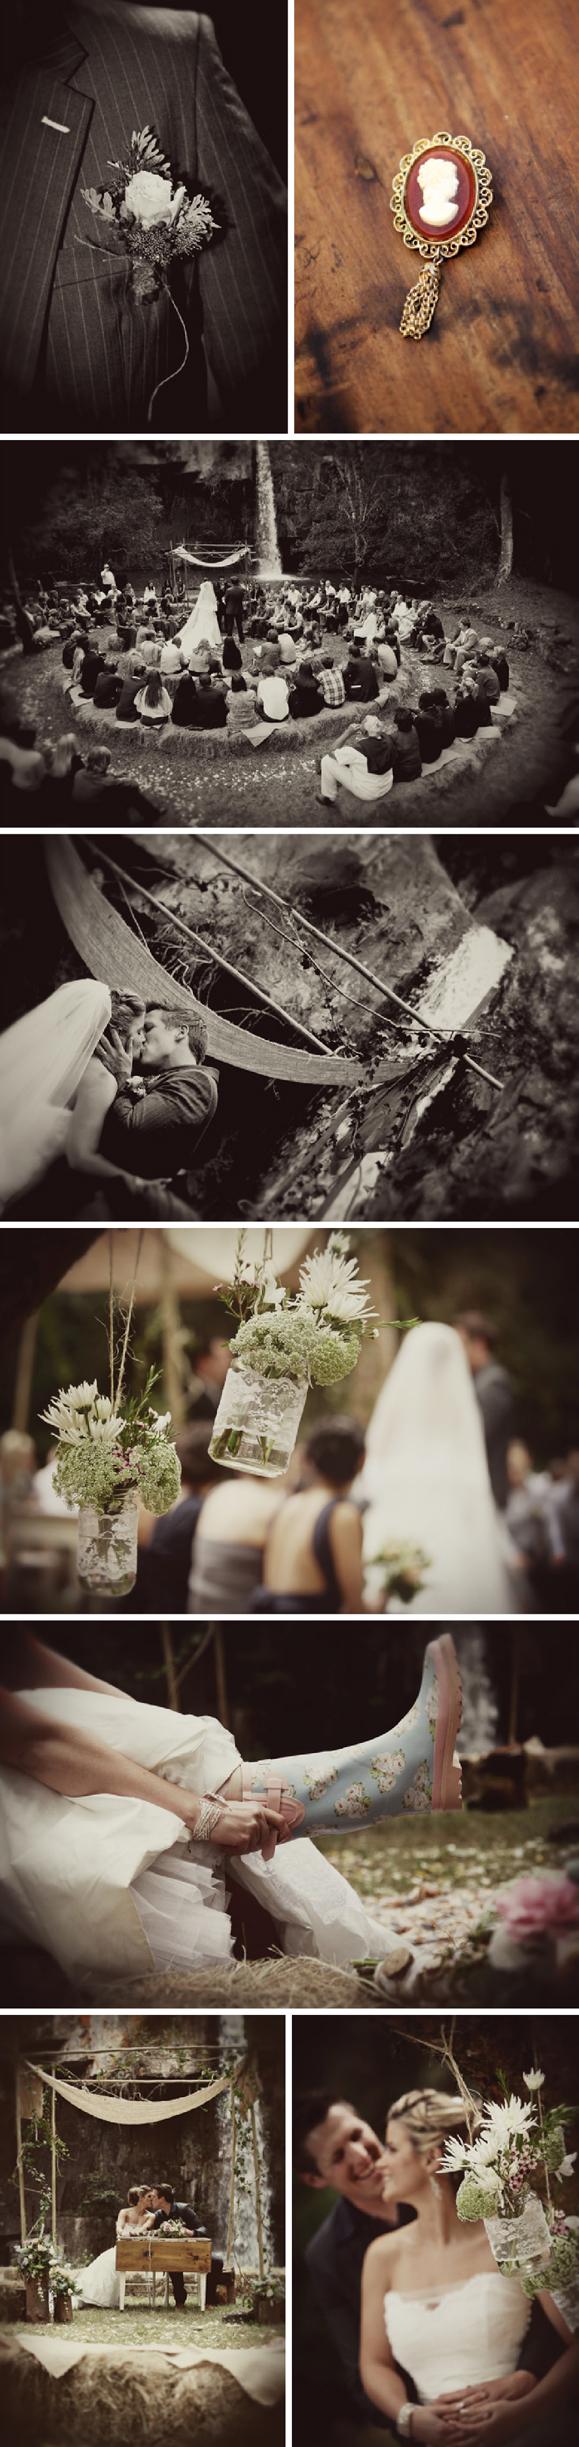 OUR_WEDDING_03.jpg